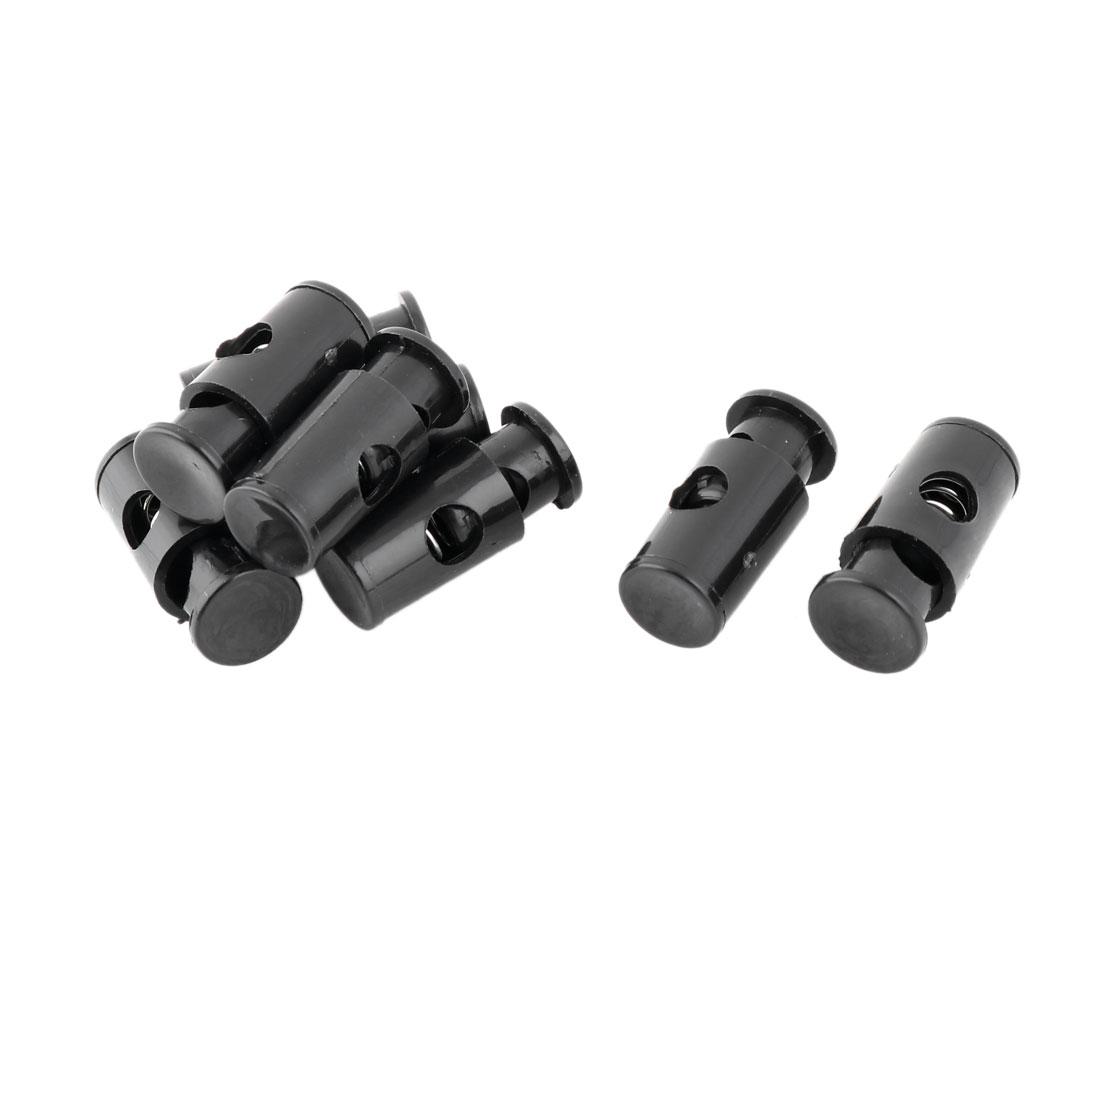 Plastic Spring Loaded Adjustive Clothes Sliding Cord Lock Stopper Black 8pcs